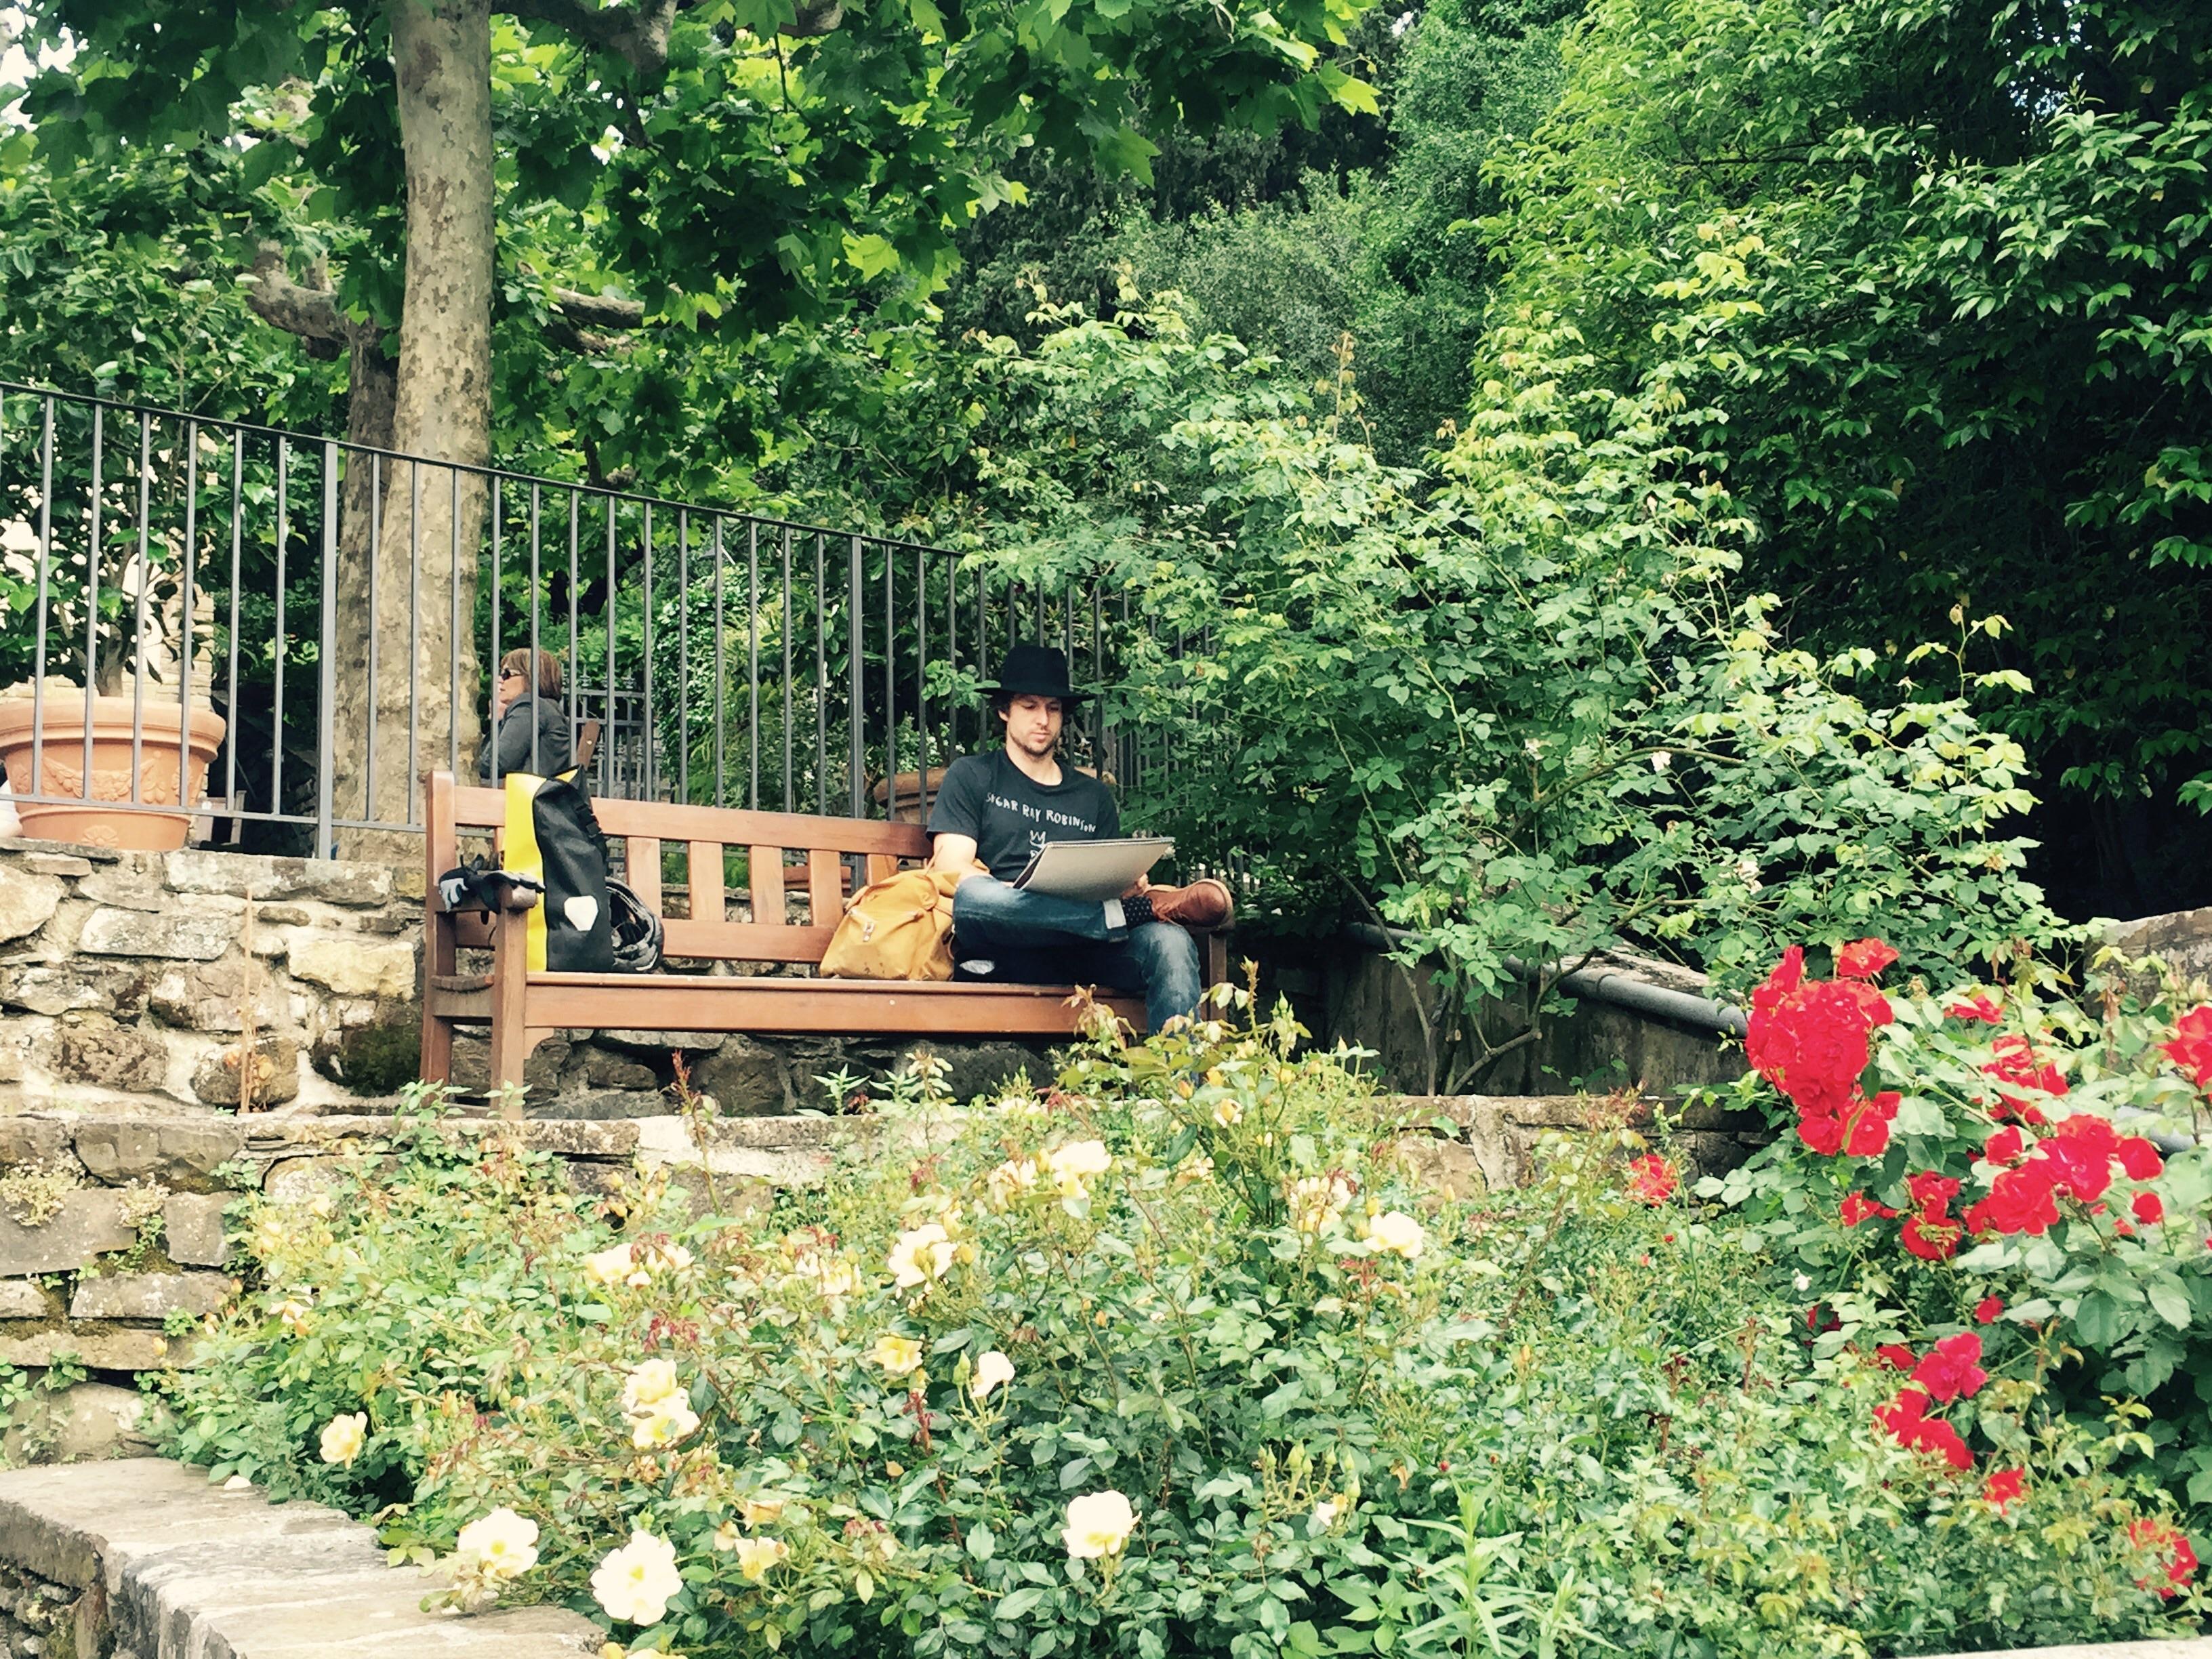 Dan sketching in the Rose Garden, Florence